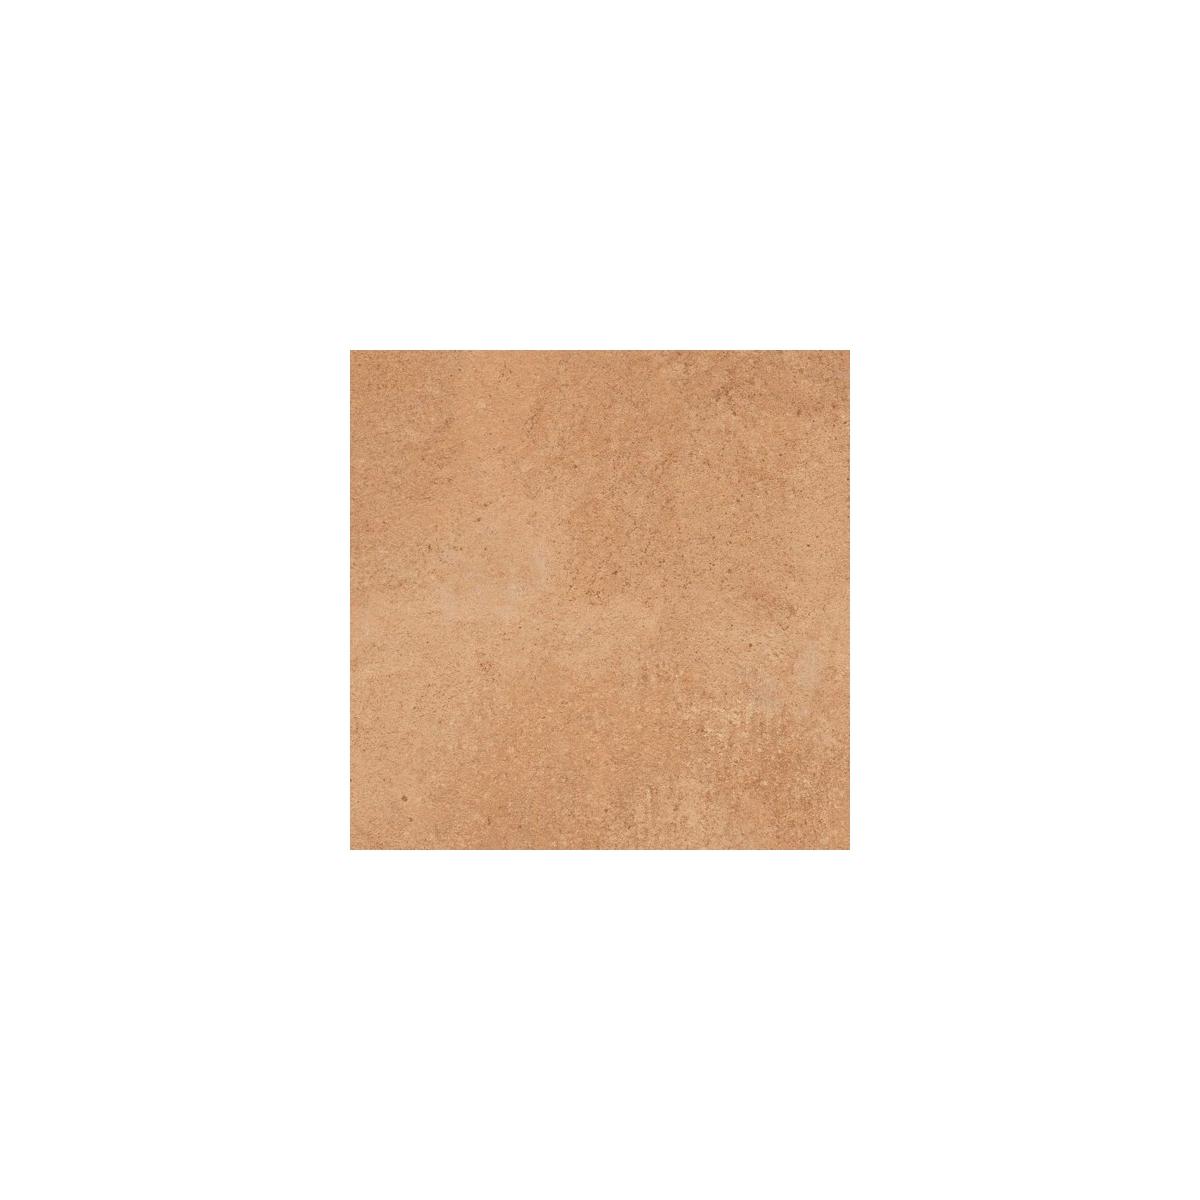 Alarcón Barro (caja) - Colección Alarcón de Vives - Marca Vives